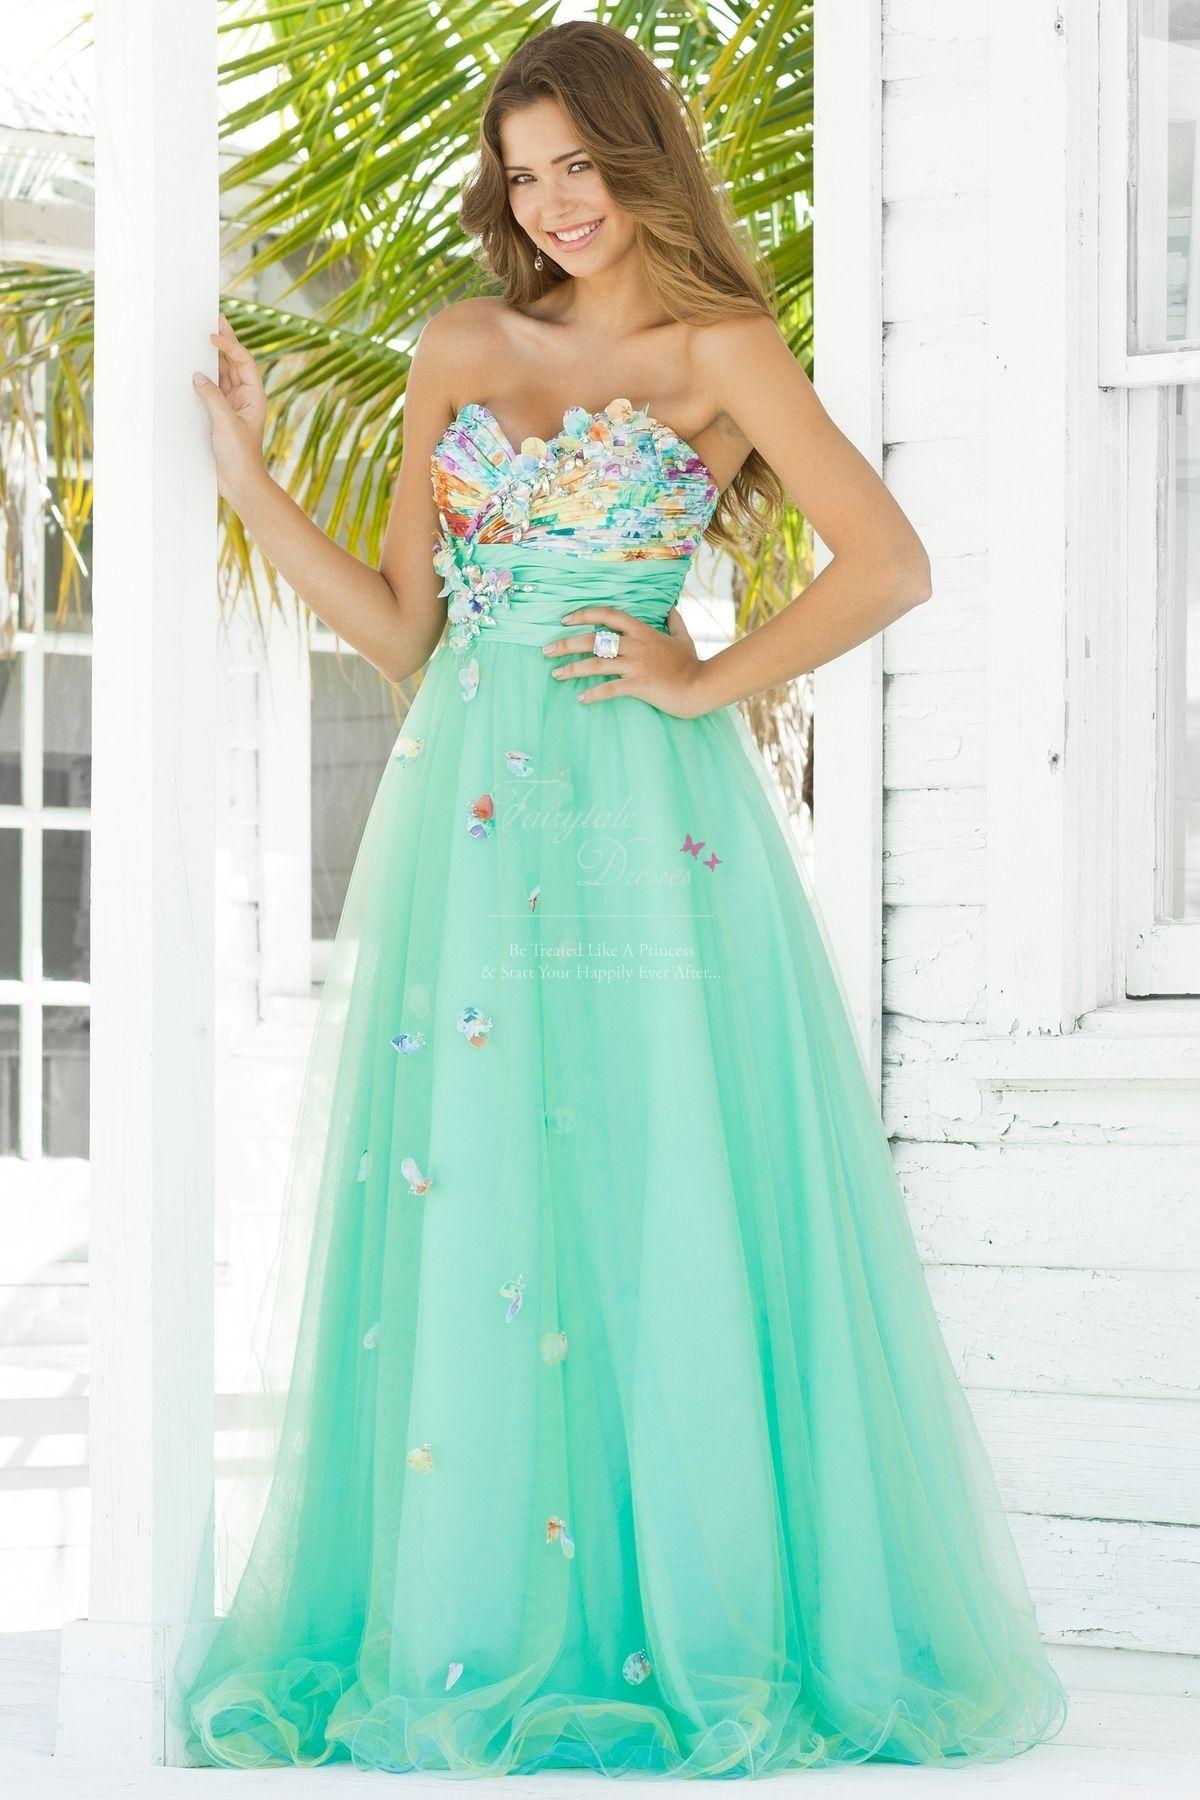 Blush 5135 Mint | UK - Fairytale Dresses | Prom dresses ...